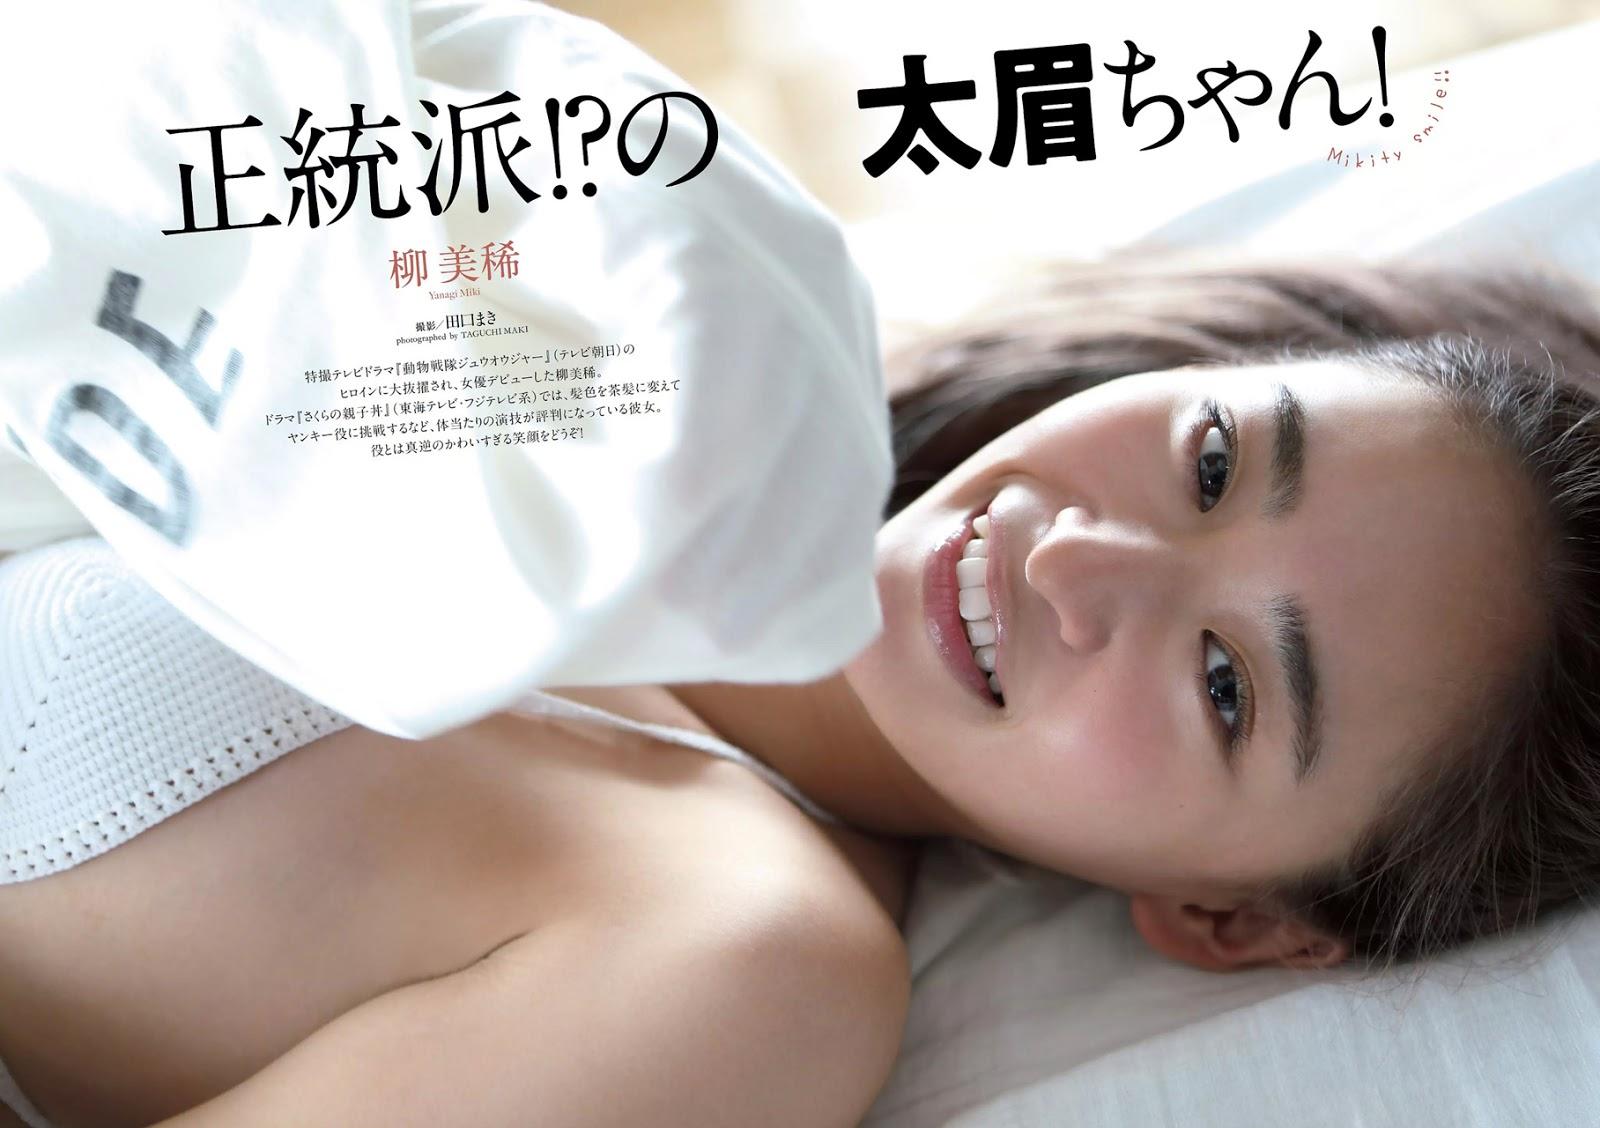 Miki Yanagi 柳美稀, Weekly Playboy 2017 No.51 (週刊プレイボーイ 2017年51号)